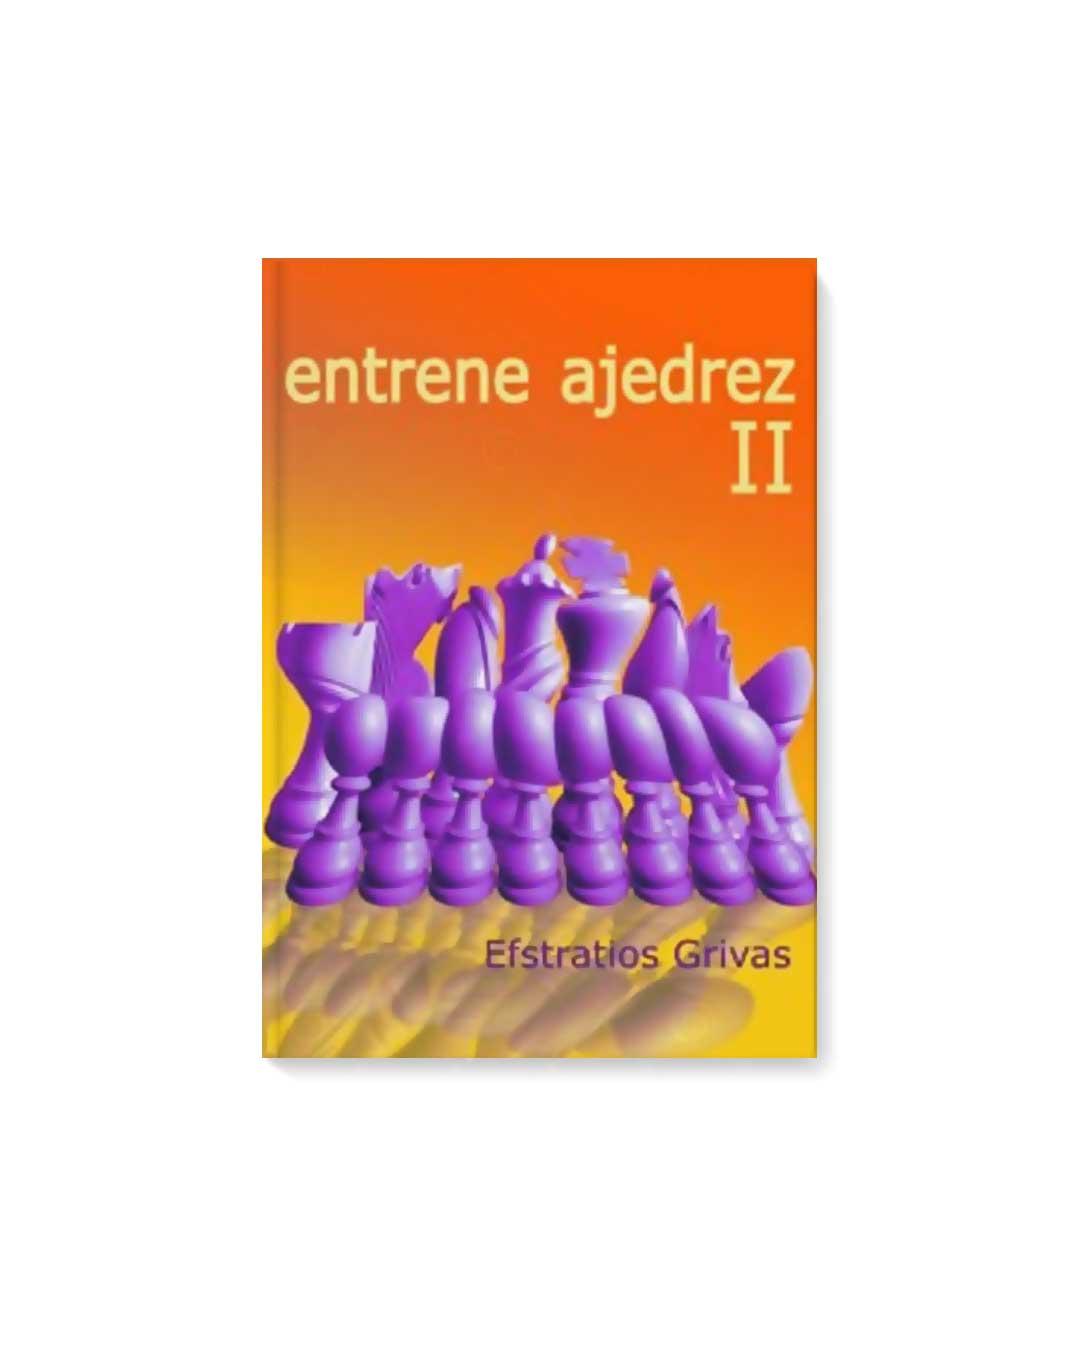 Entrene ajedrez vol. 2 - Grivas